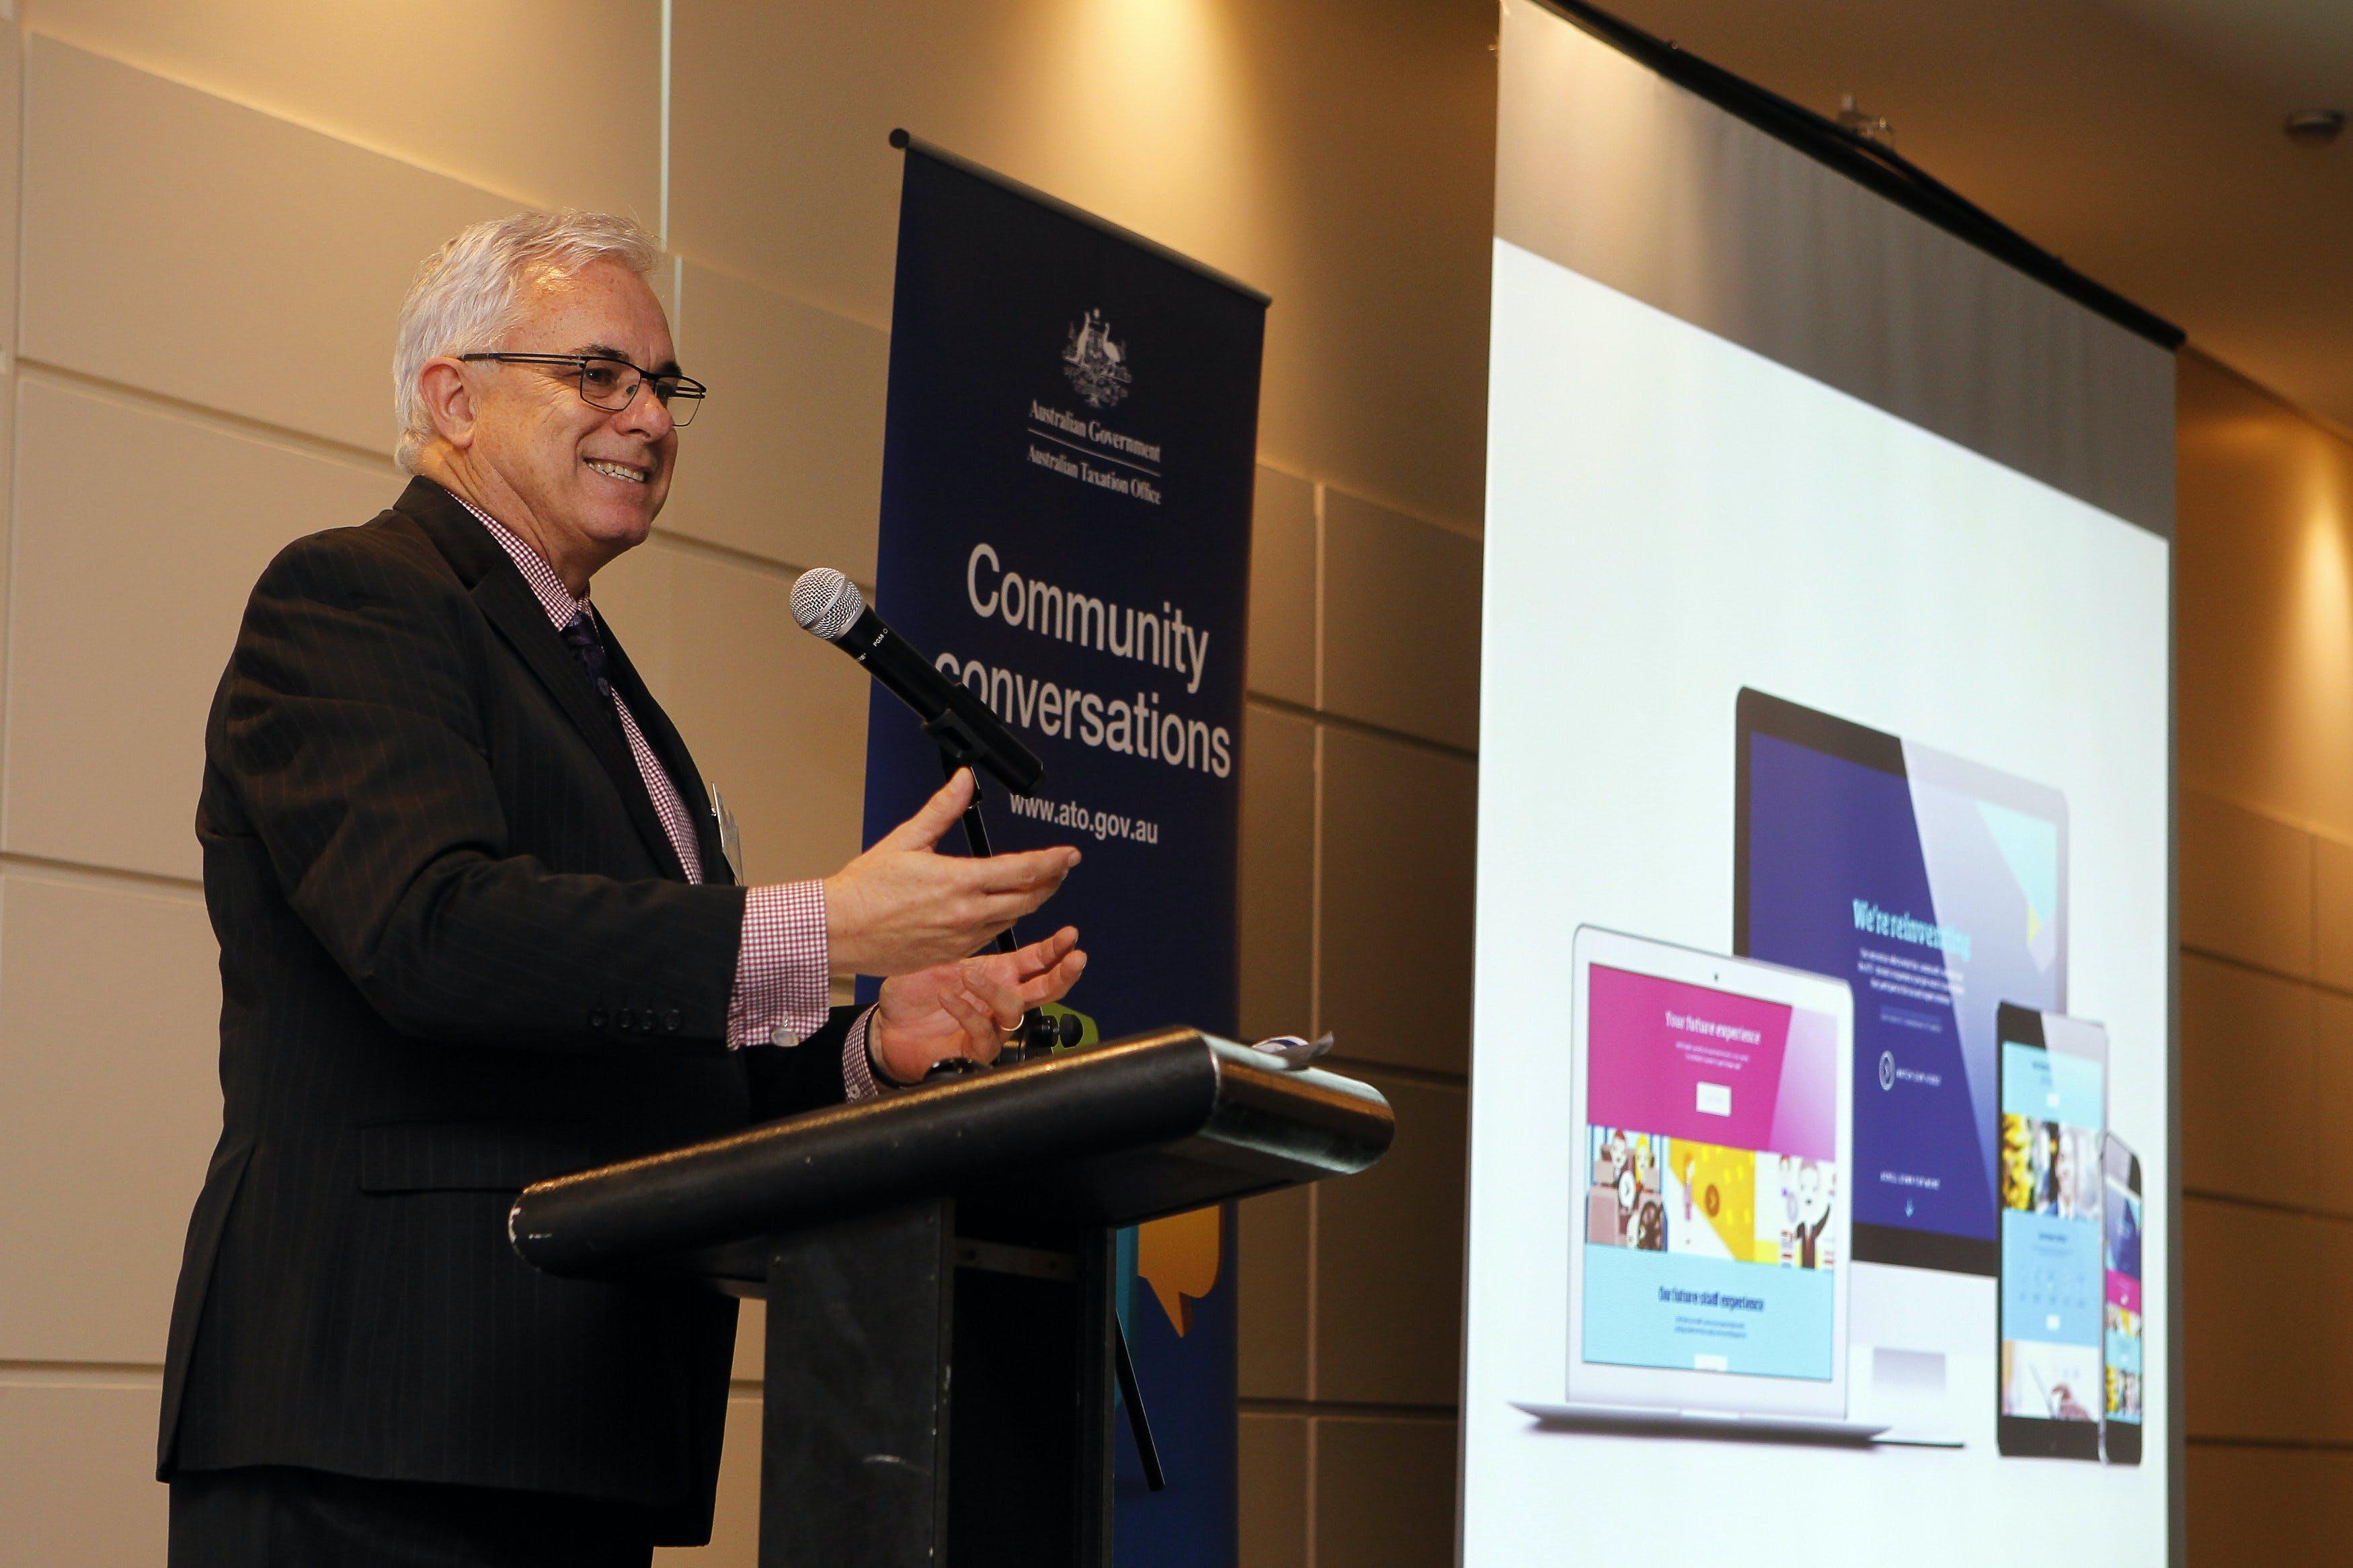 Community Conversation - Wollongong